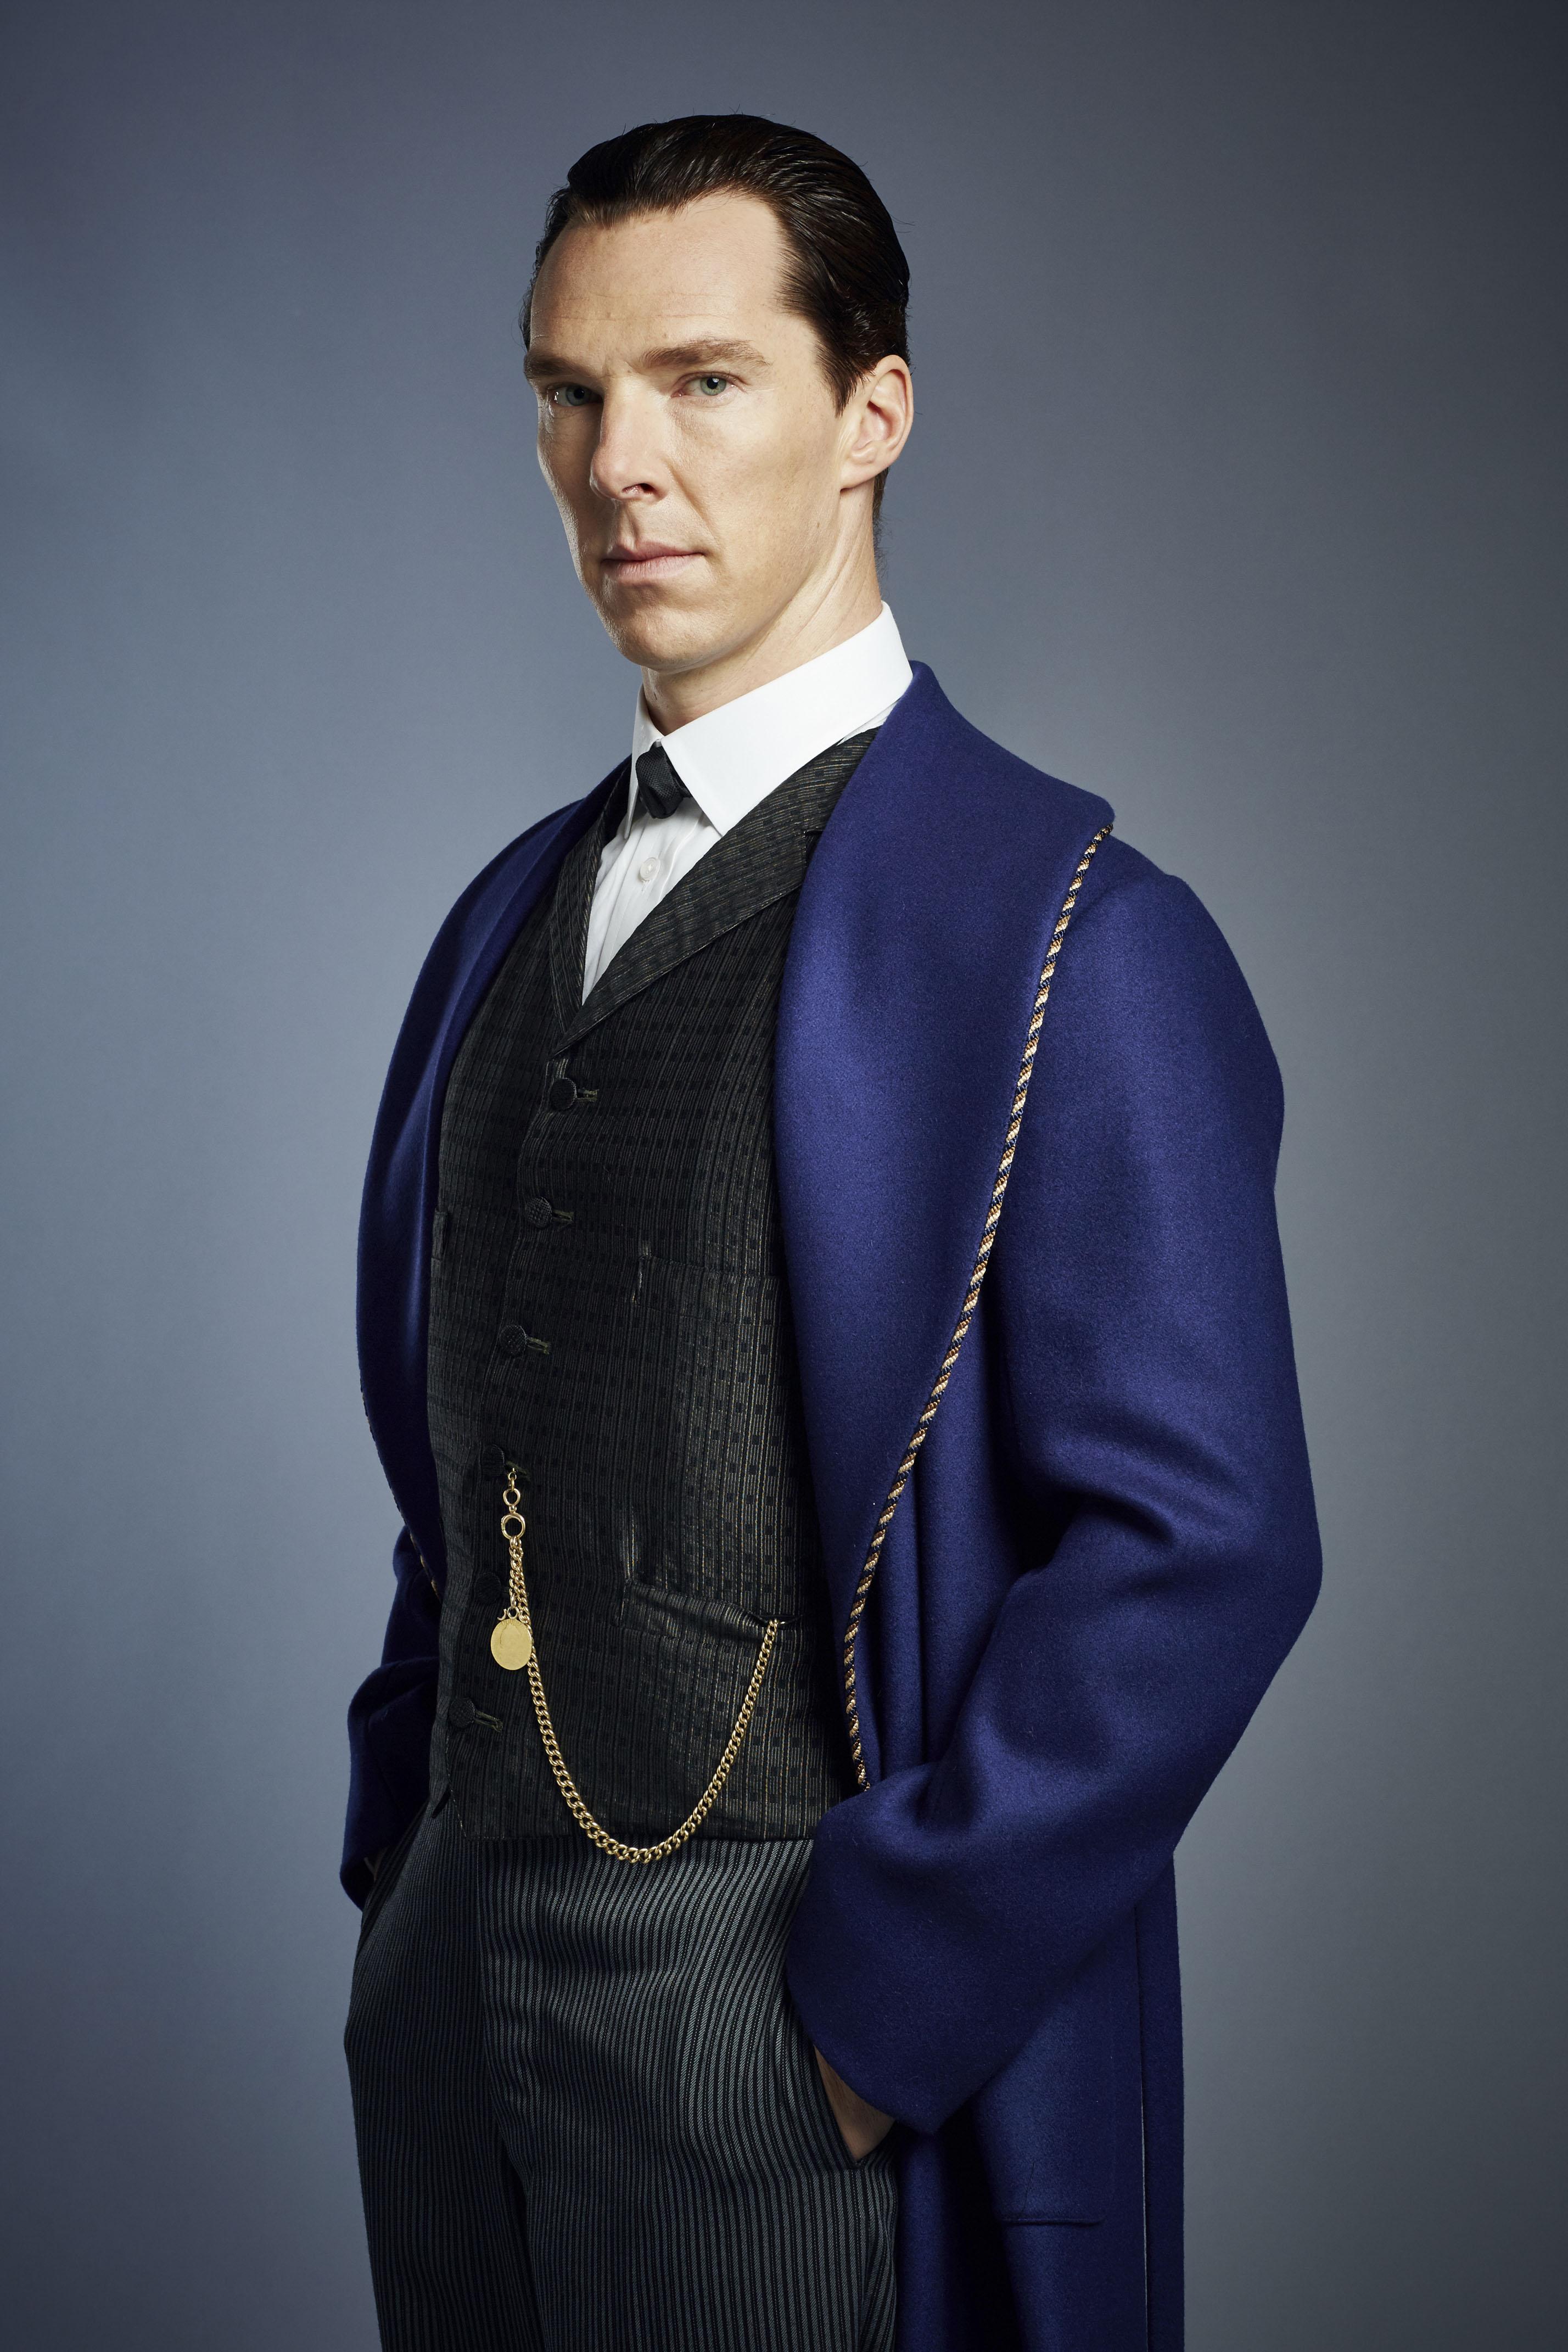 Sherlock Holmes (Sherlock BBC1) images Sherlock Holmes - Promo and ...